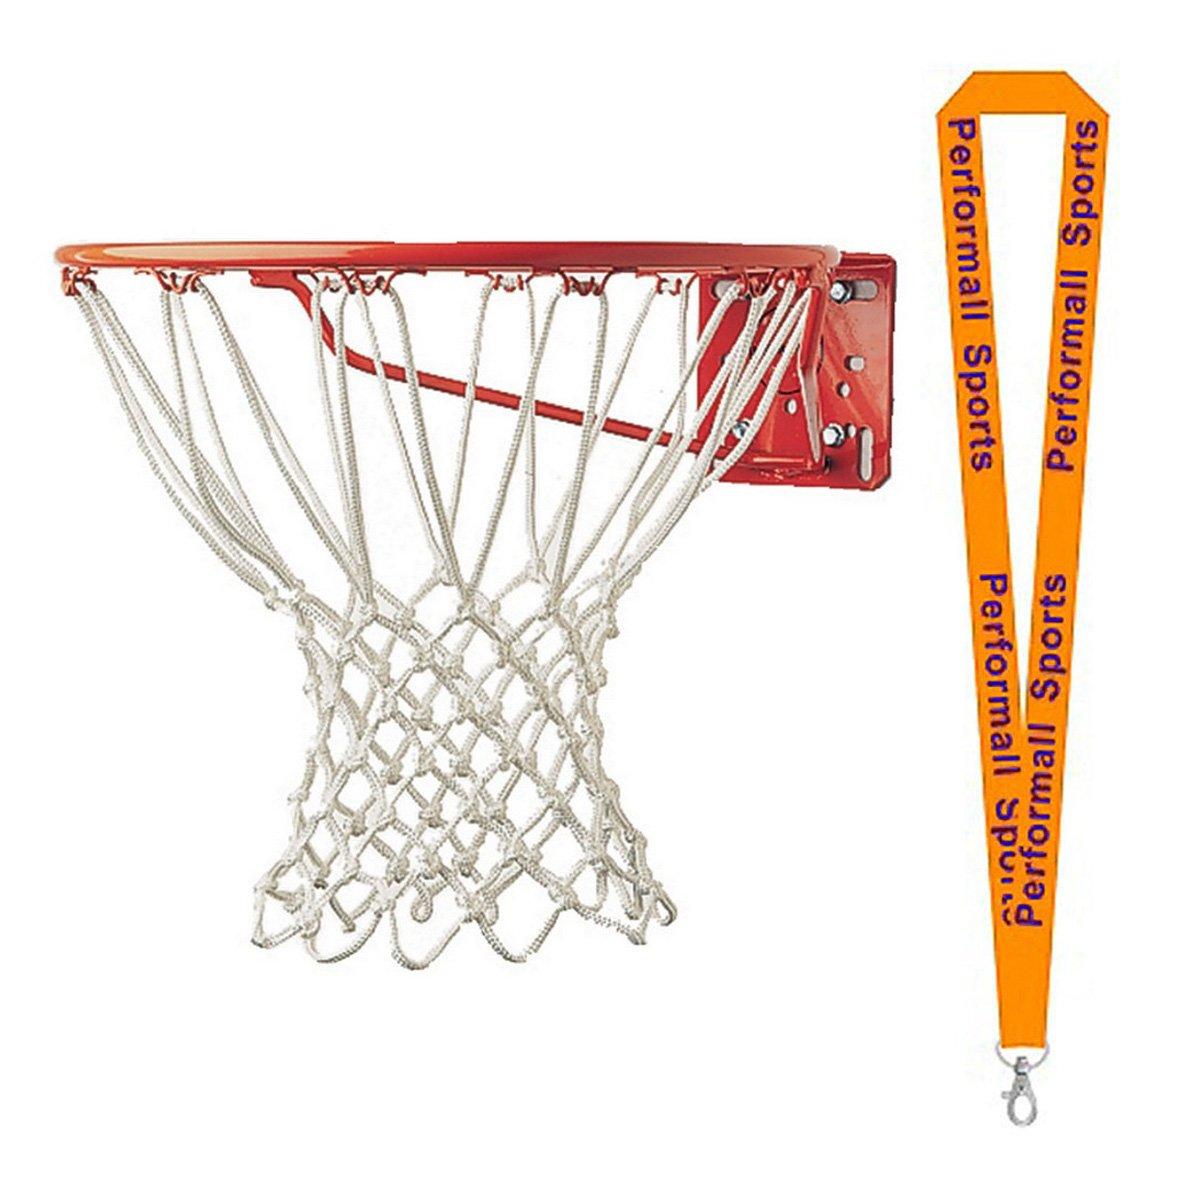 Championスポーツバスケットボールフープnet-non Whipホワイト( Set of 2 ) with 1 performall Lanyard 417 – 2p B01FSZ7FTK